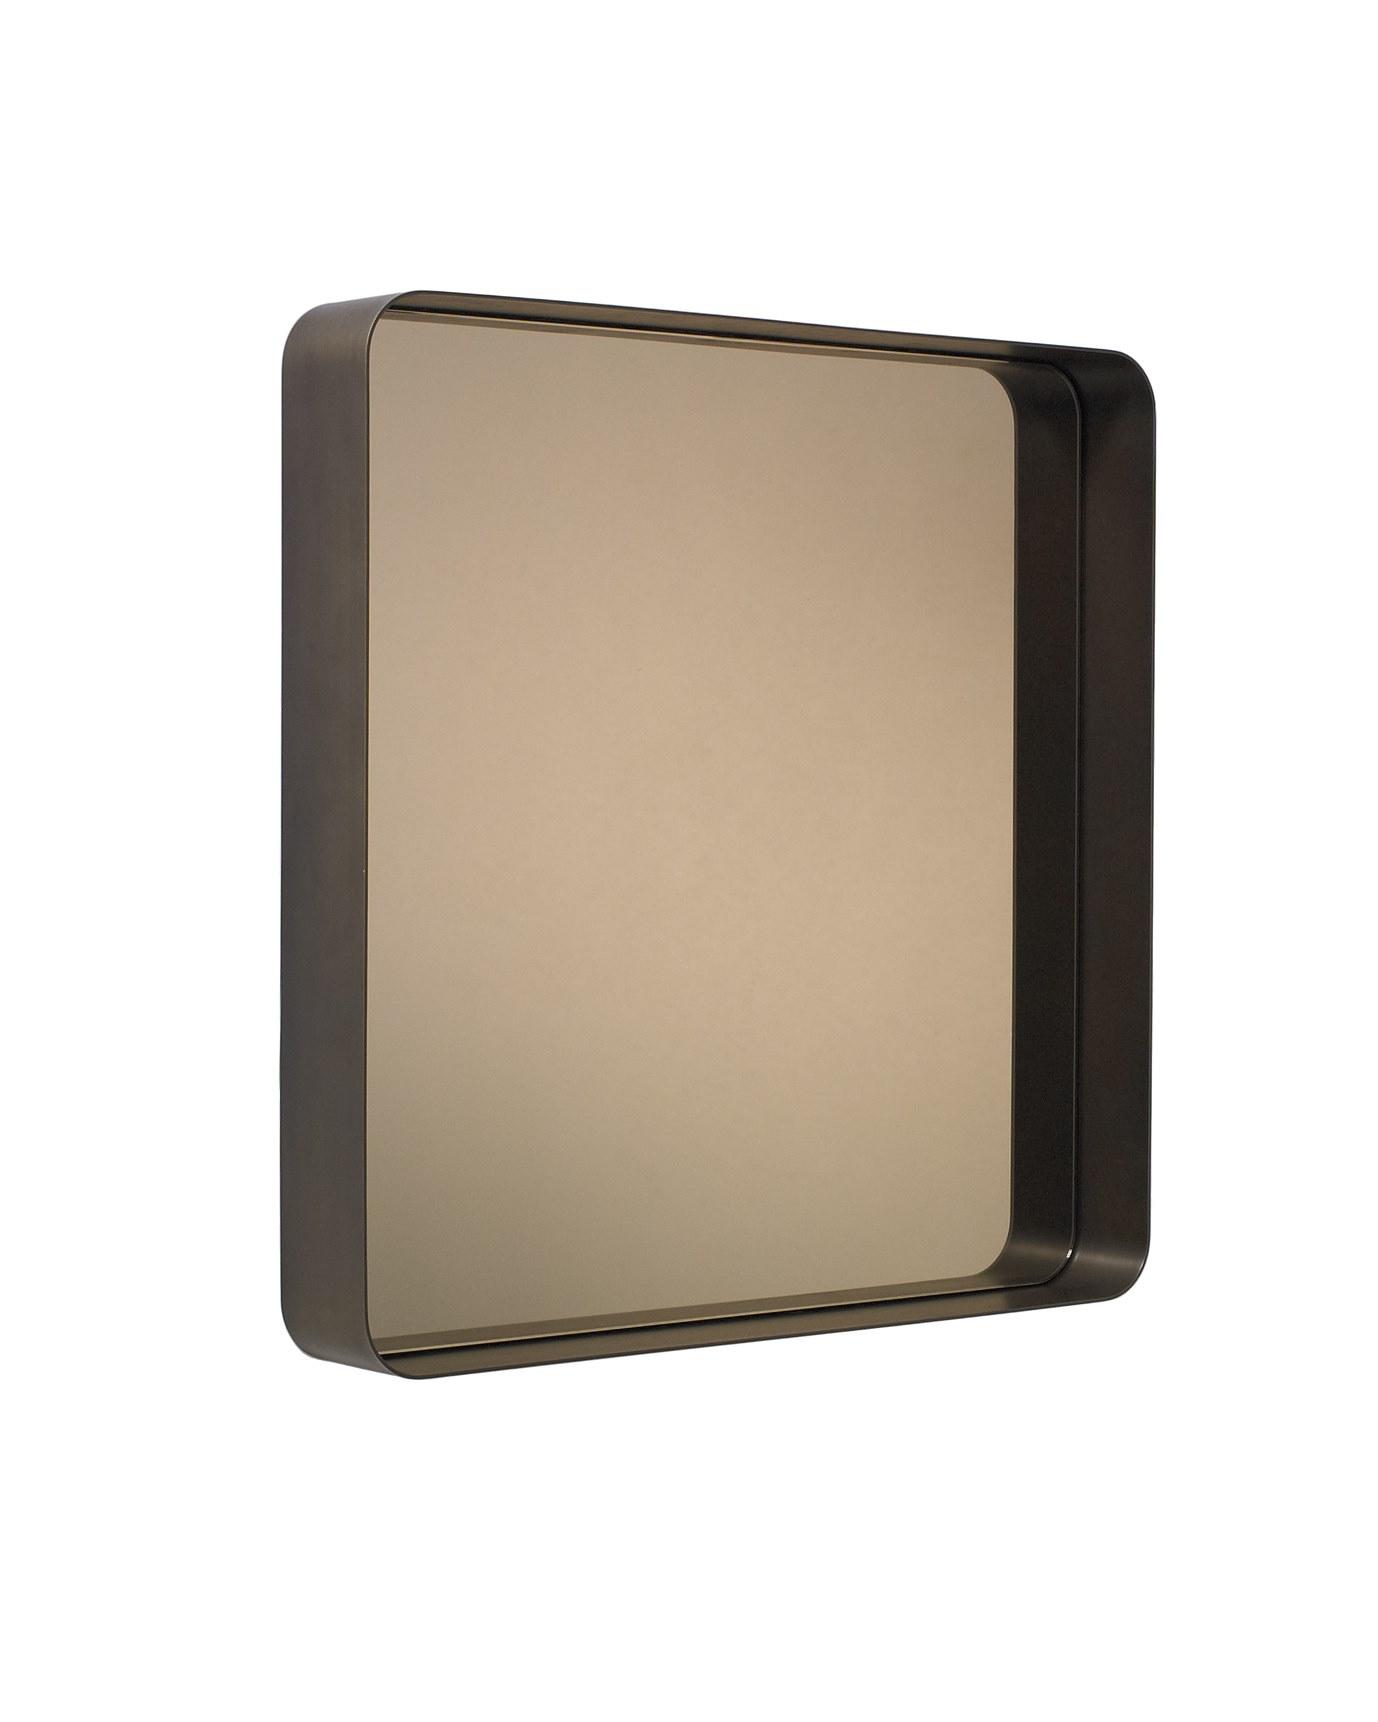 Messing brüniert / Parasolglas bronzefarbig